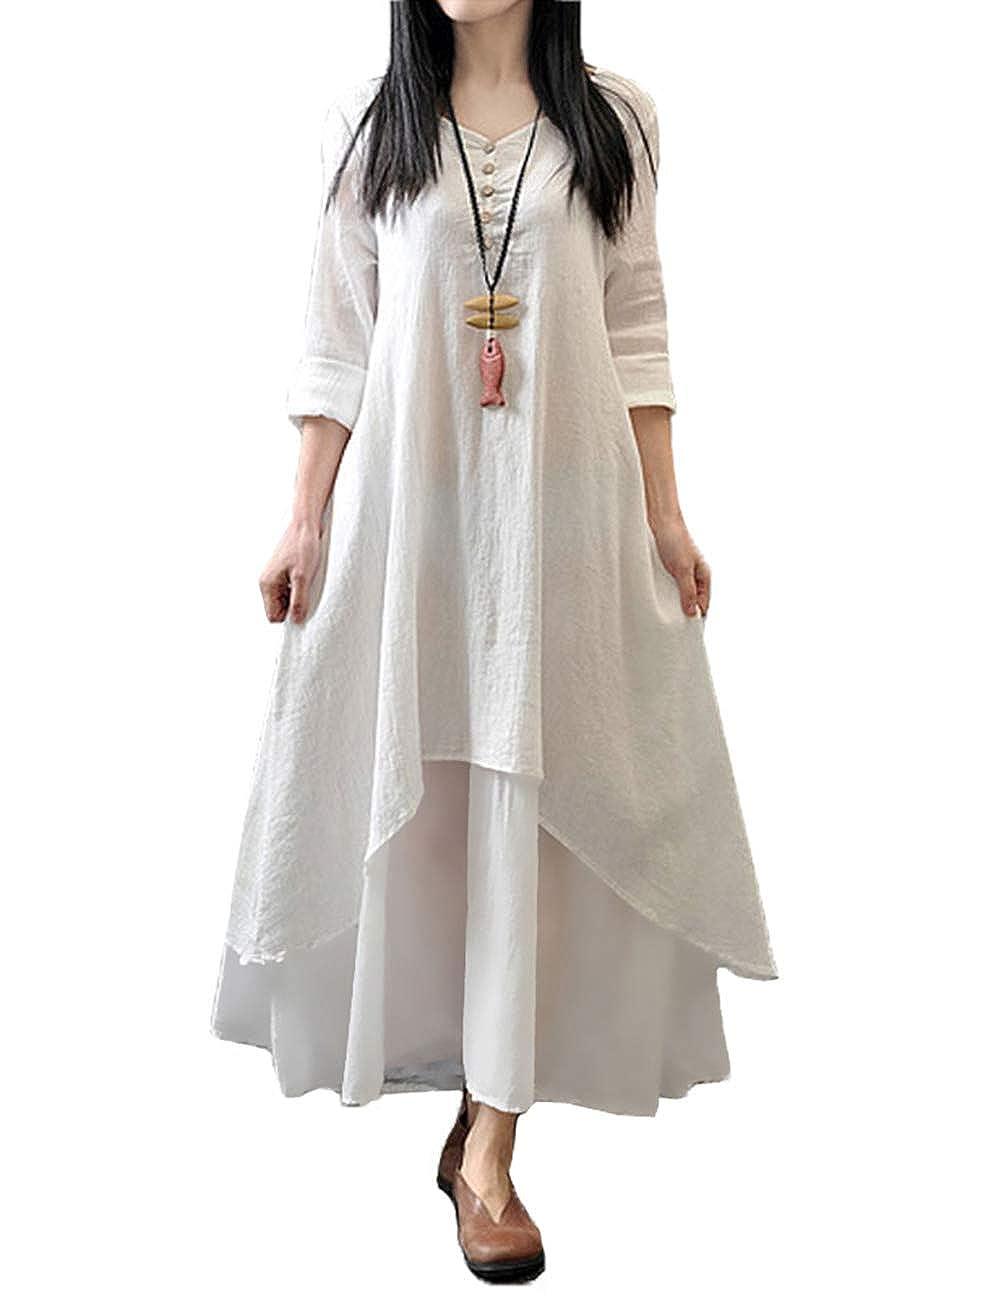 TALLA 3XL. Romacci Vestido Suelto Vestido Ocasional de Las Mujeres Manga Larga Sólida Maxi Vestido Largo de Boho Blanco 3XL